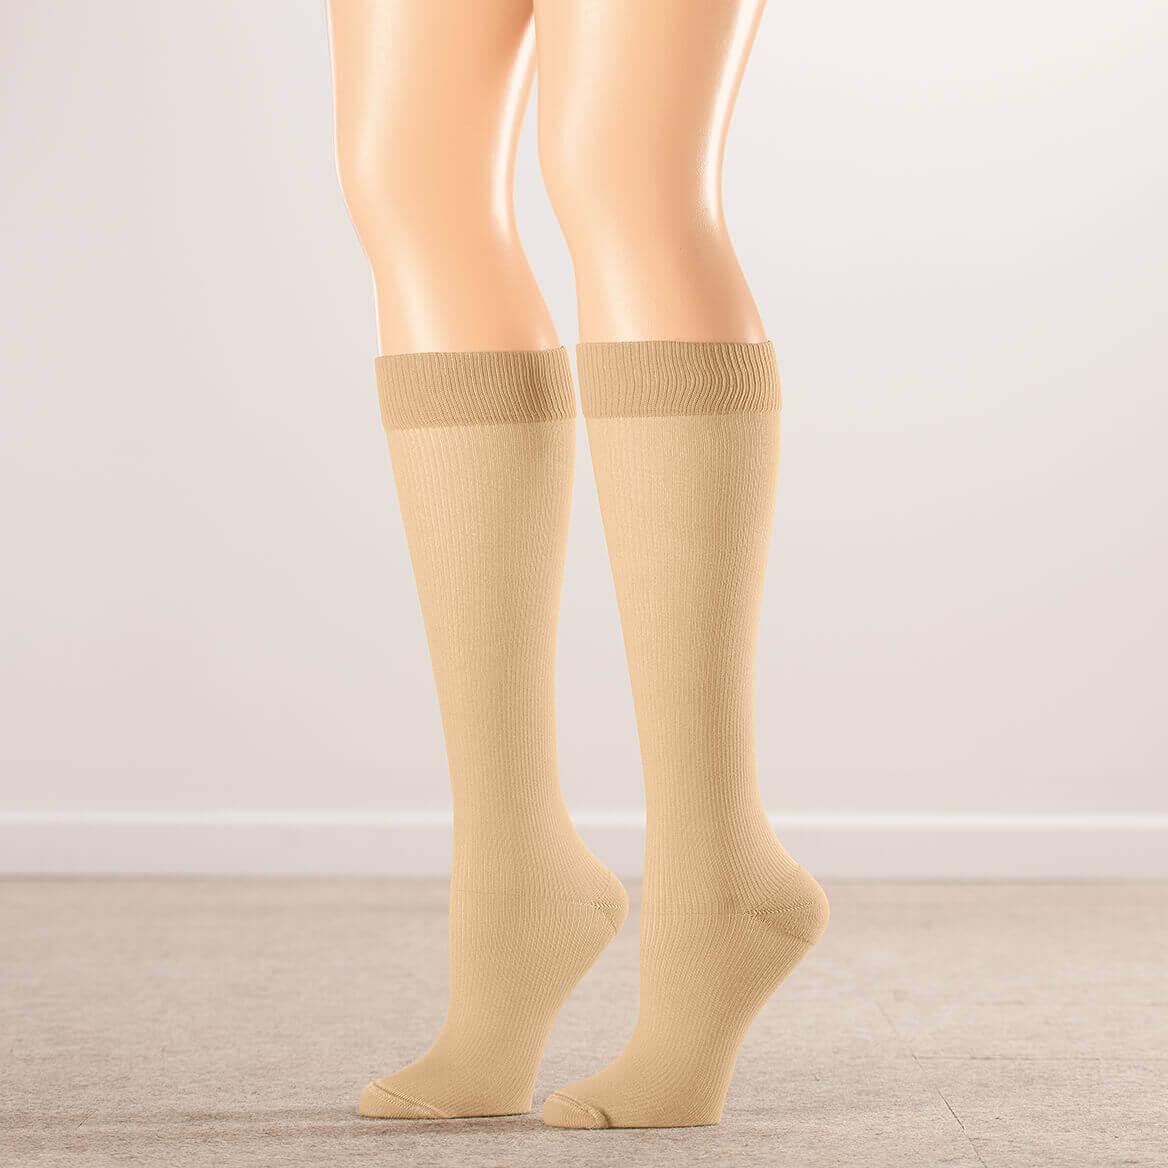 Silver Steps™ Compression Socks 15-20 mmHg-354138